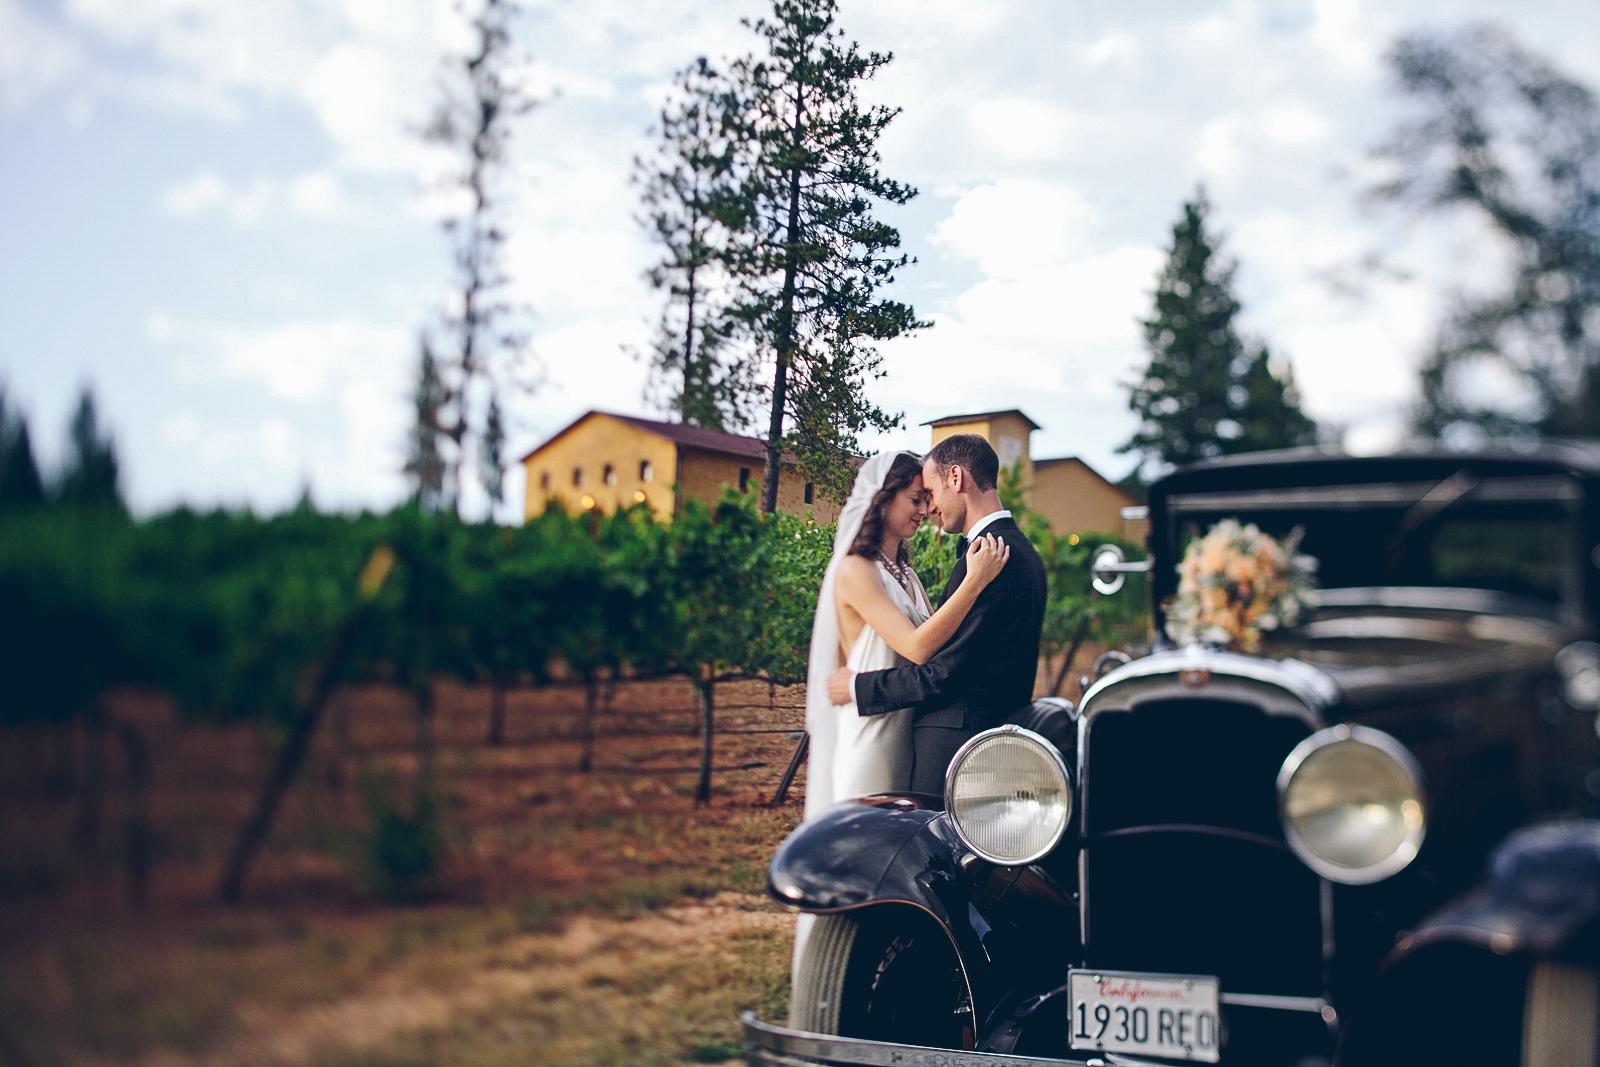 miraflores_winery_wedding_photography_ian_melissa_ebony_siovhan_bokeh_photography_42.jpg